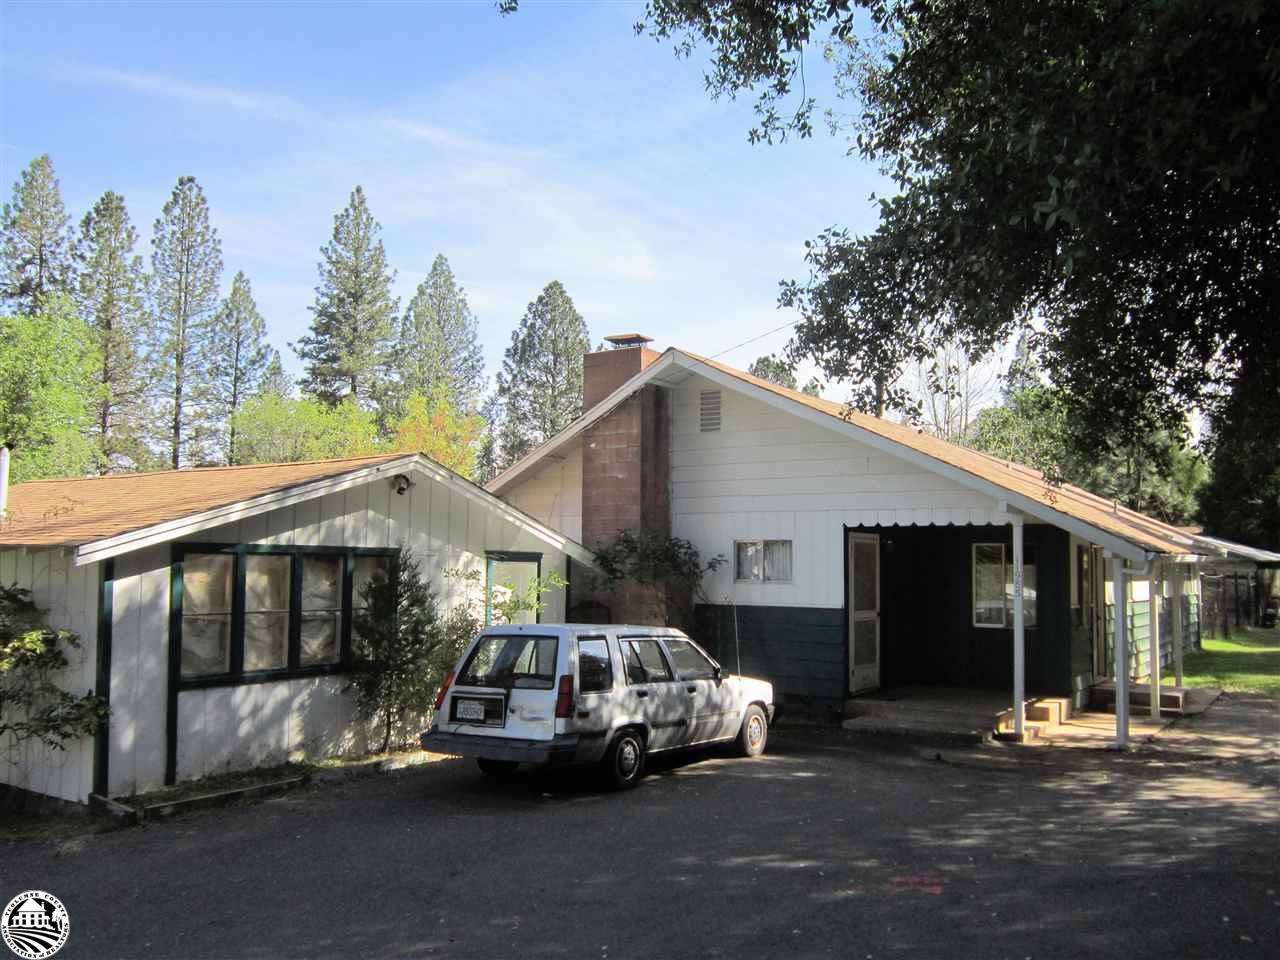 11985 BISORDI ST, GROVELAND, CA 95321